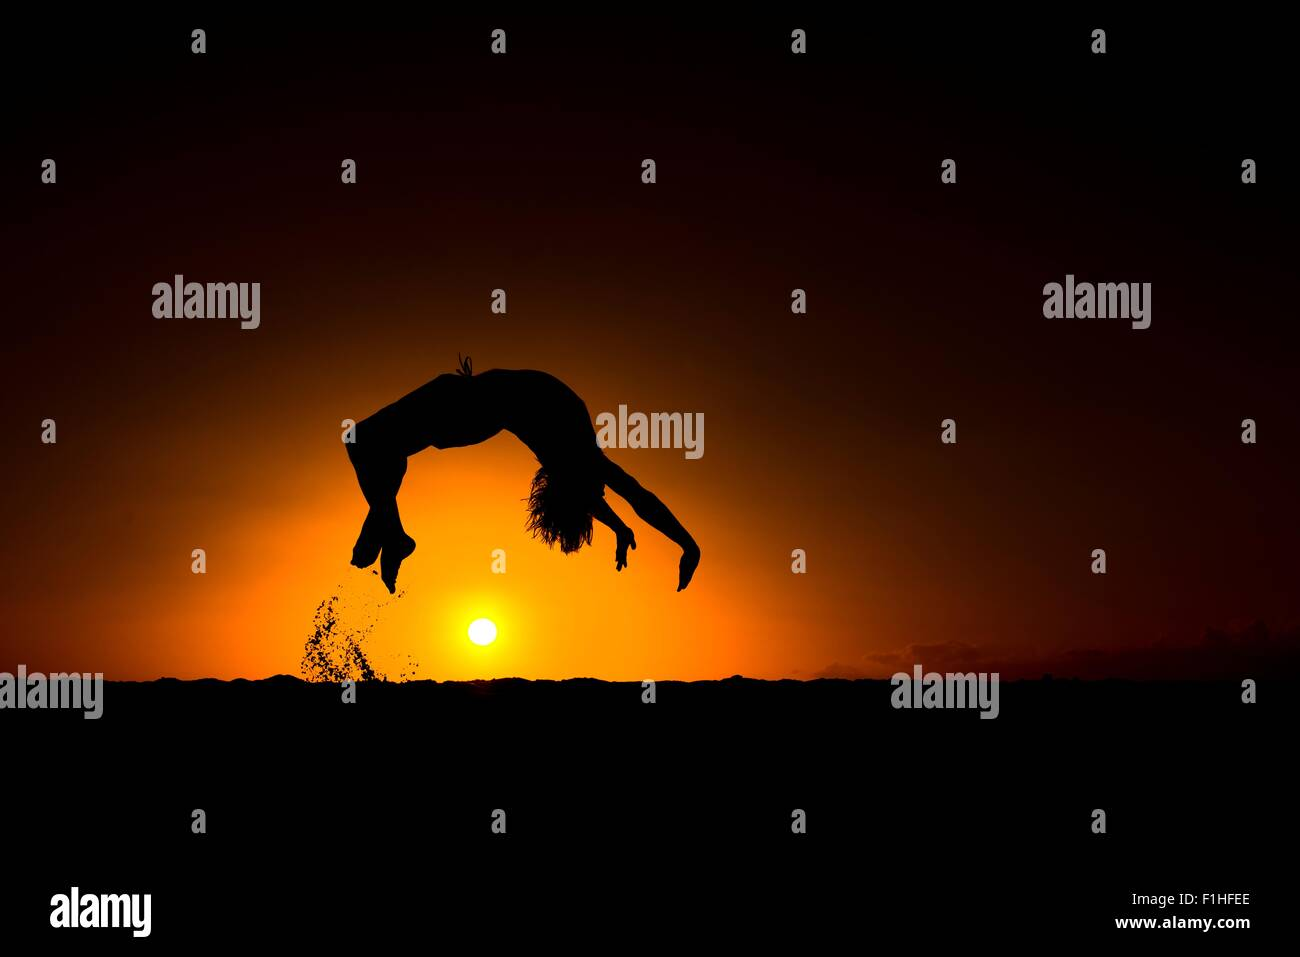 Silhouette of man doing back flip, at sunset, Omakaha, Oahu, Hawaii - Stock Image